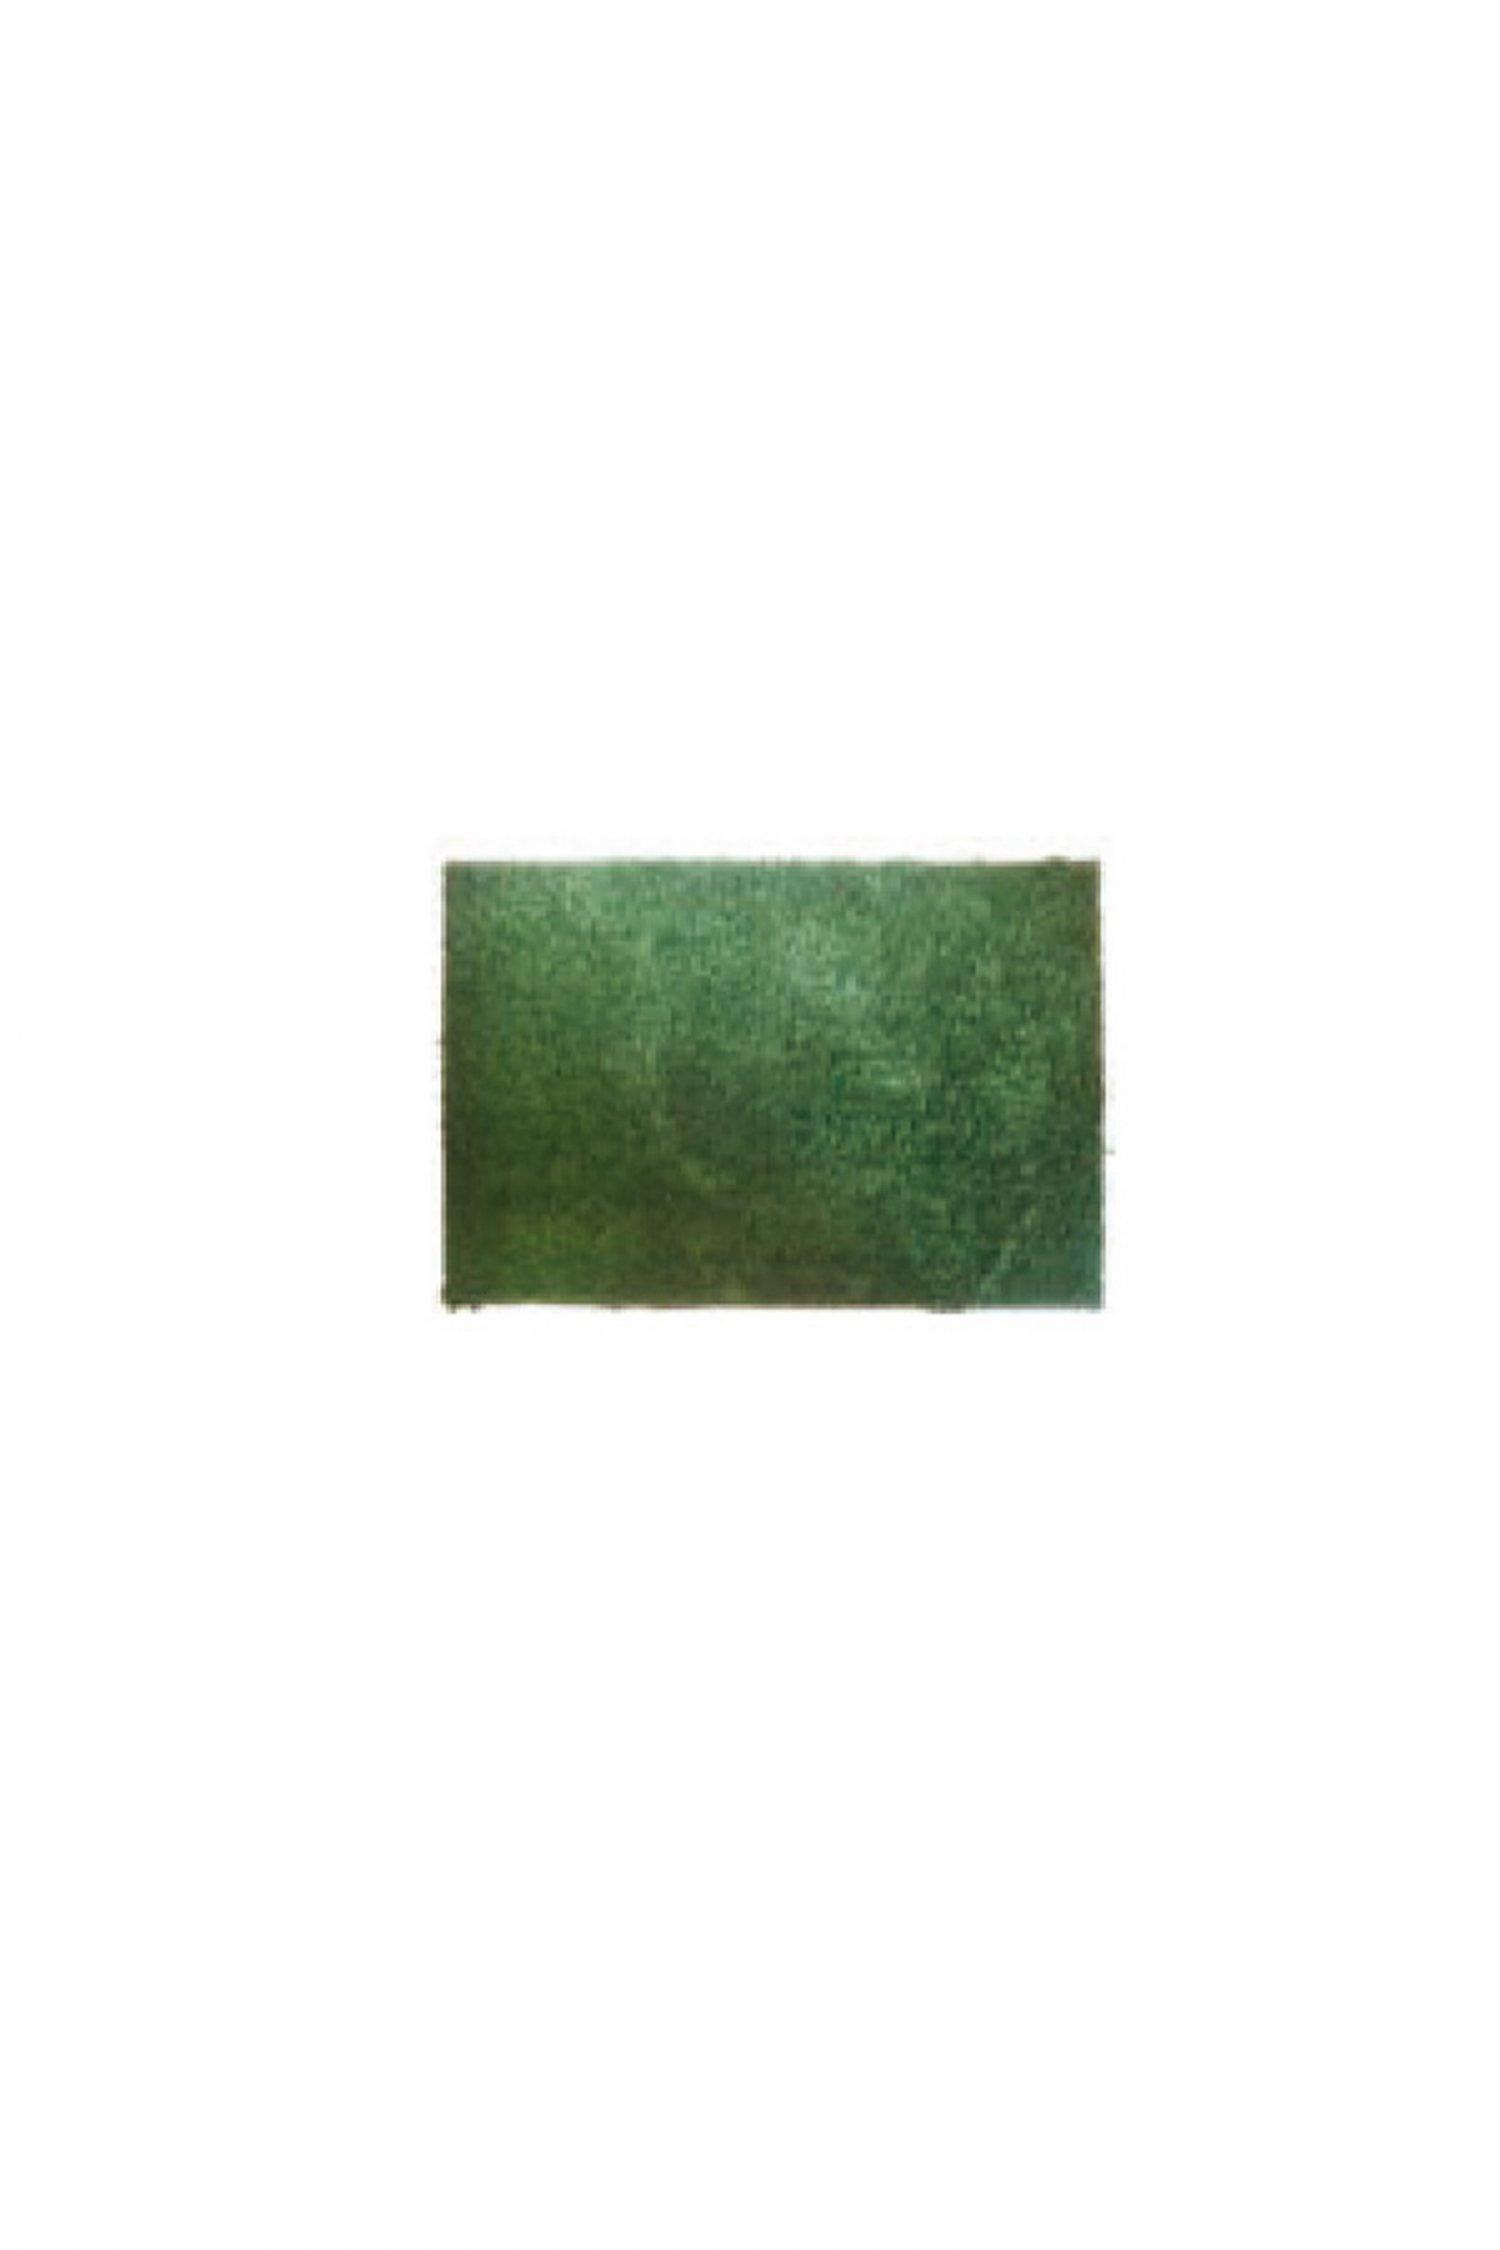 Césped artificial de 56 x 39 (018) Césped artificial de 134 x 39 (017)